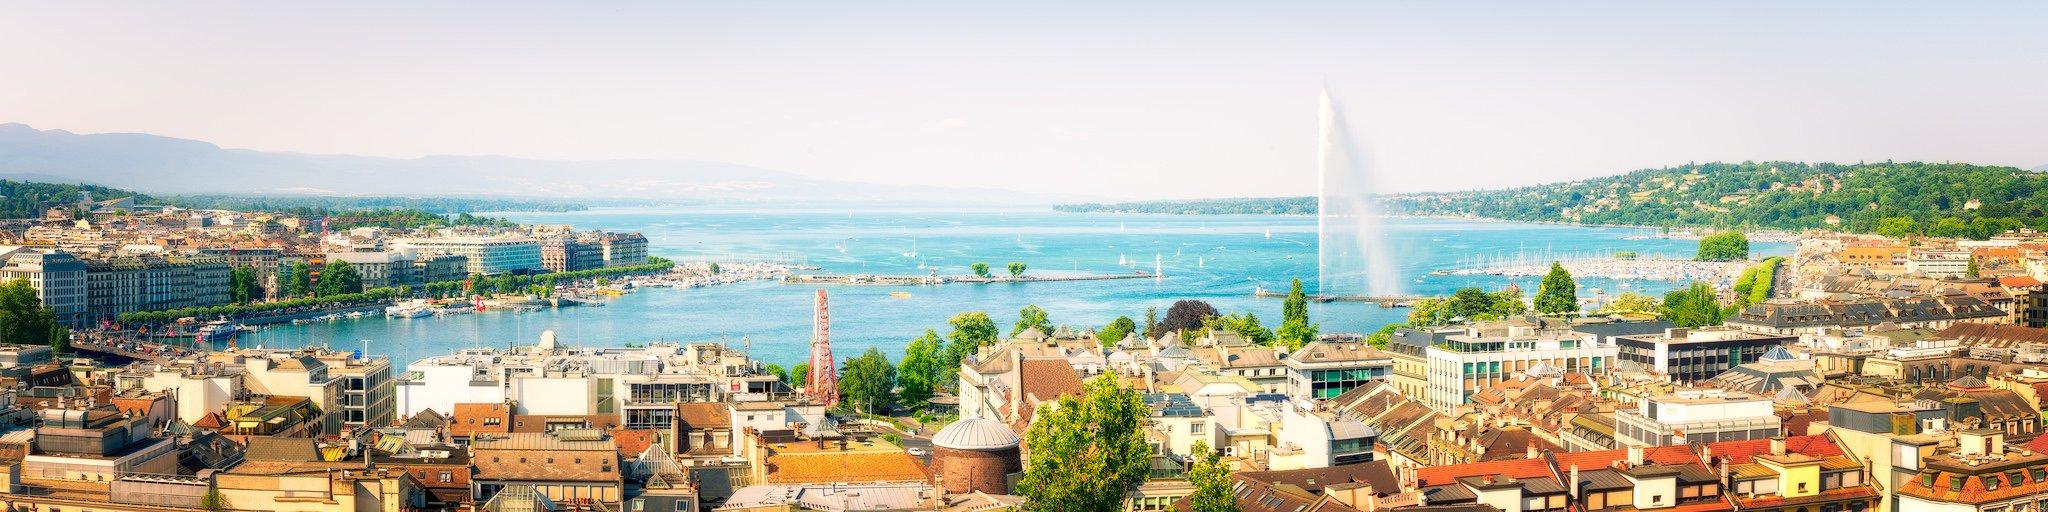 Panorama of Geneva and Lake Geneva from Jet d'Eau | Switzerland